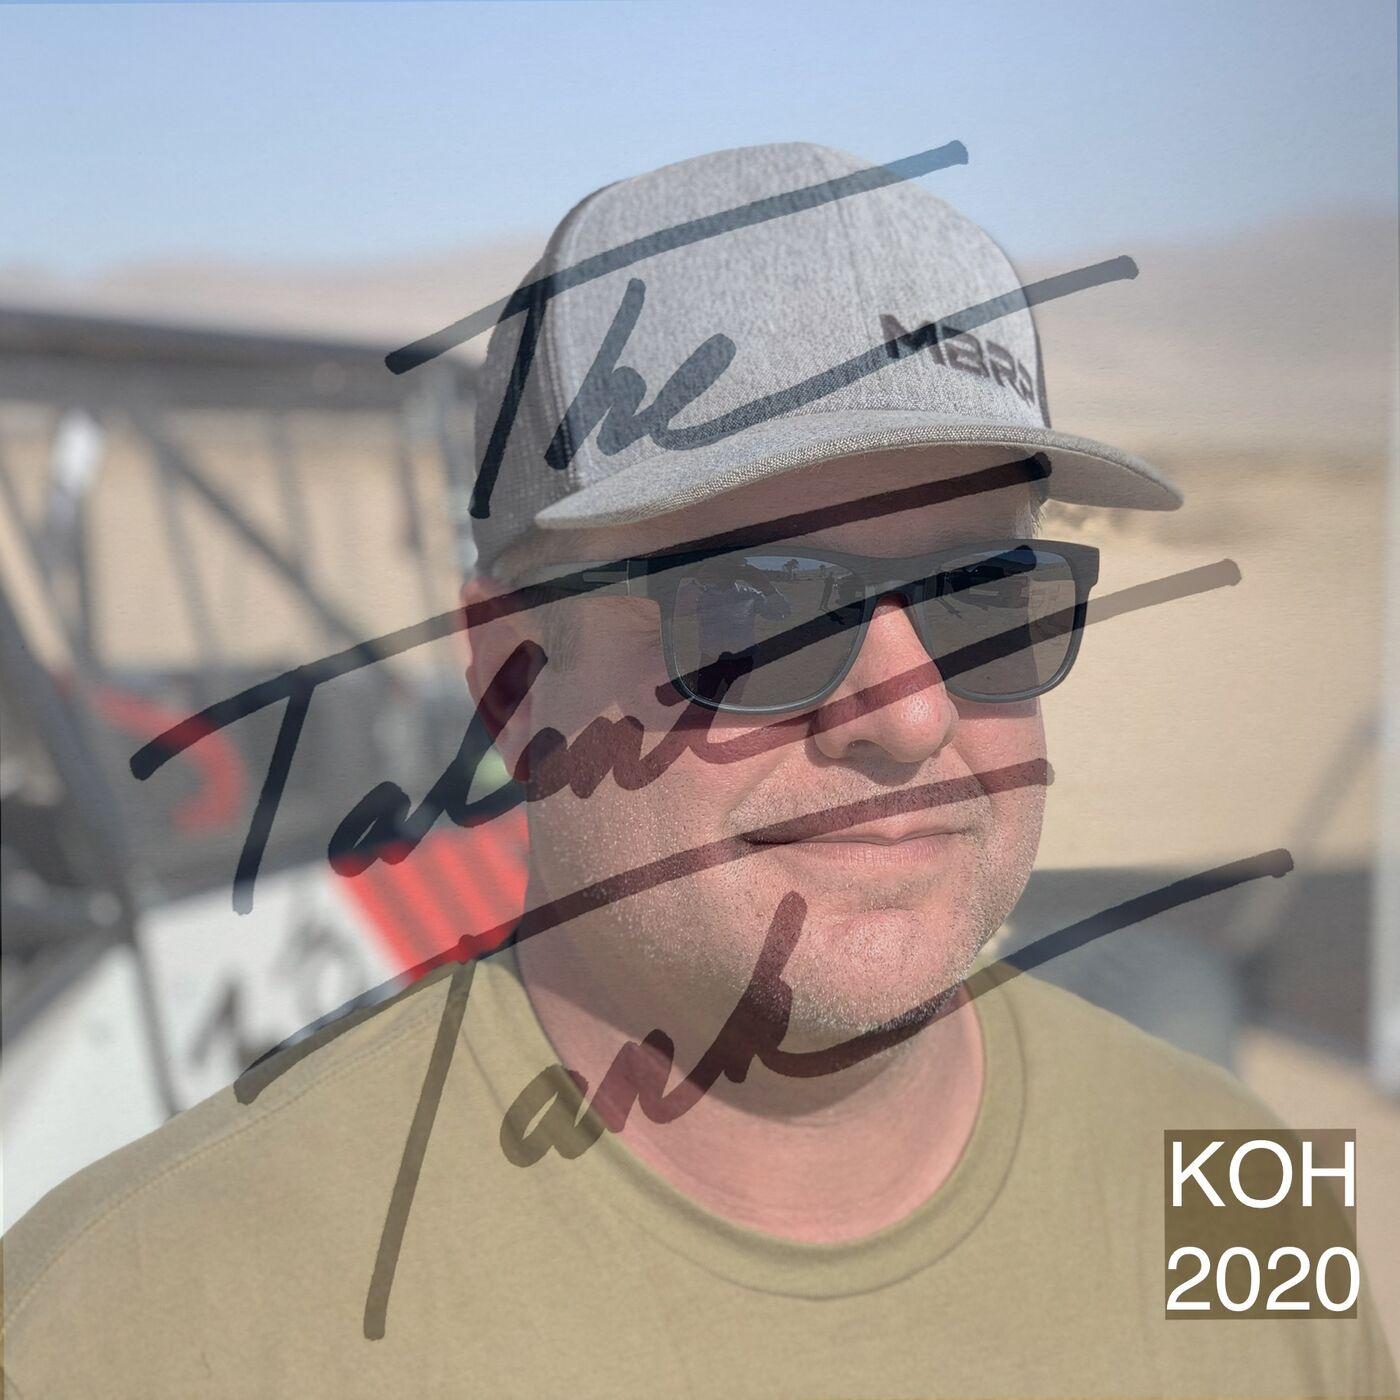 KOH2020 SP 10 David Hartman